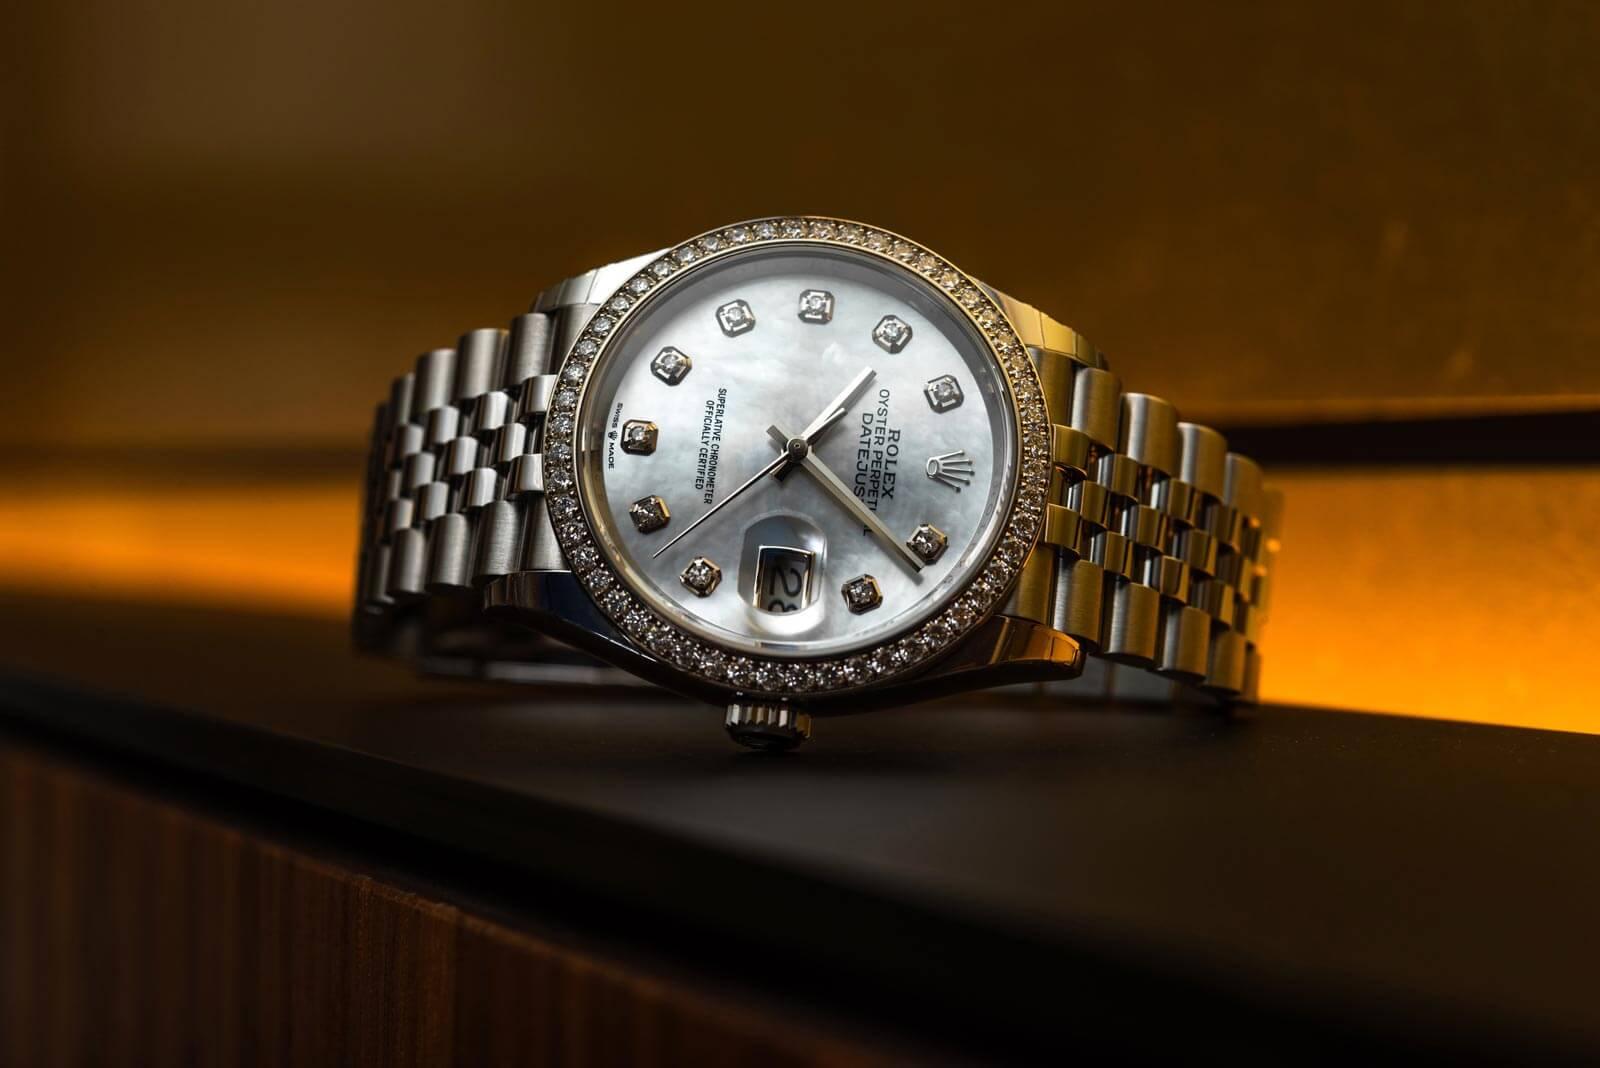 Rolex Datejust 36 <br> Referenca 126284RBR